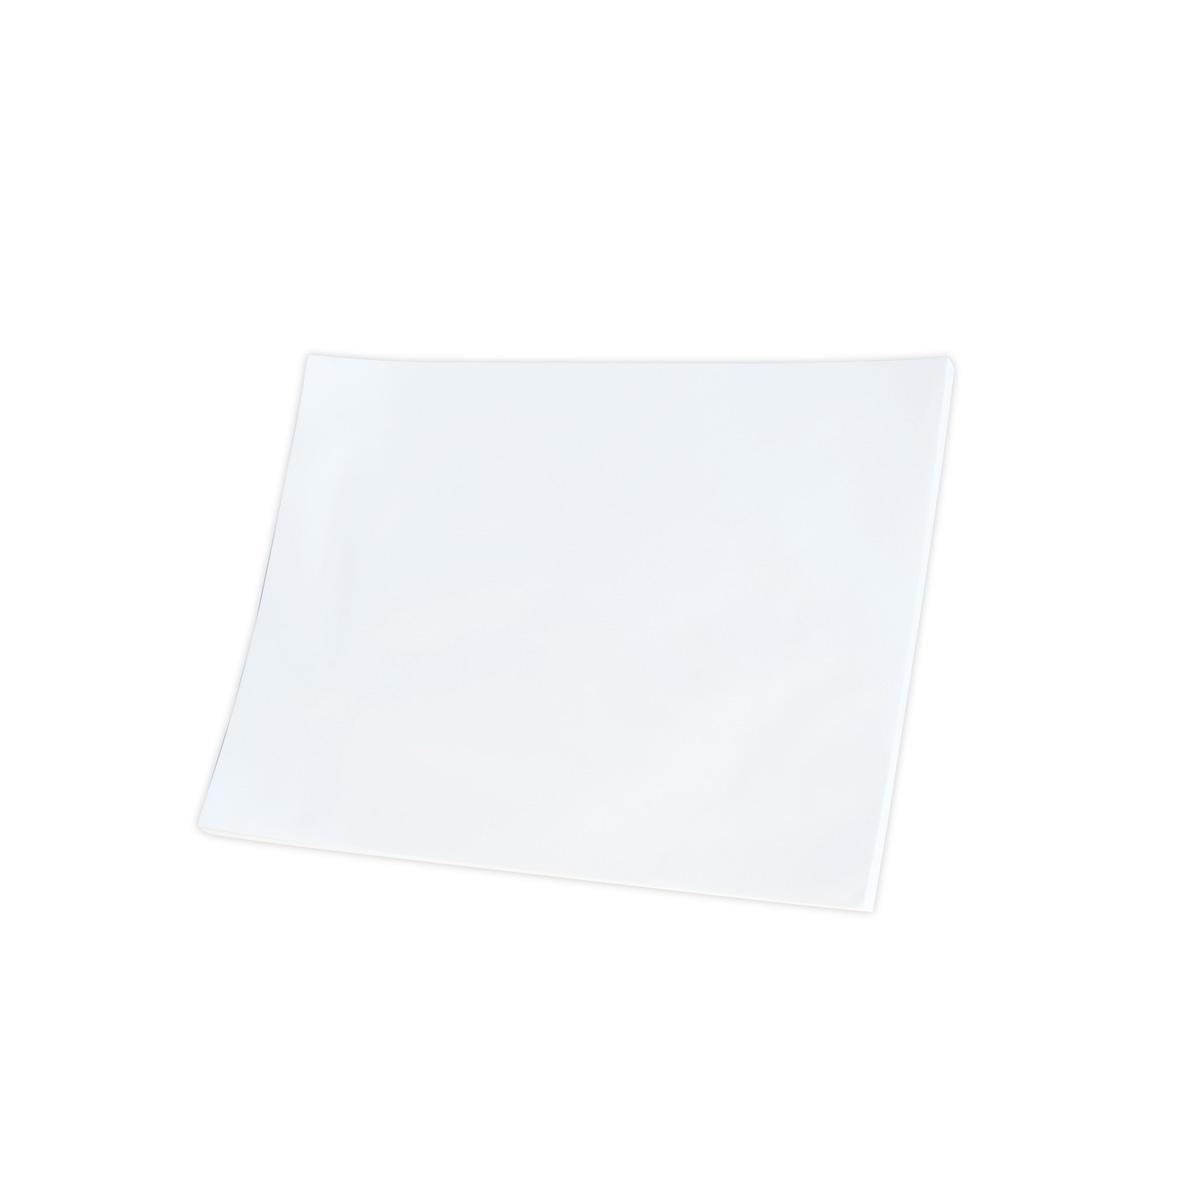 Cartridge Drawing Paper: 23cm x 30cm